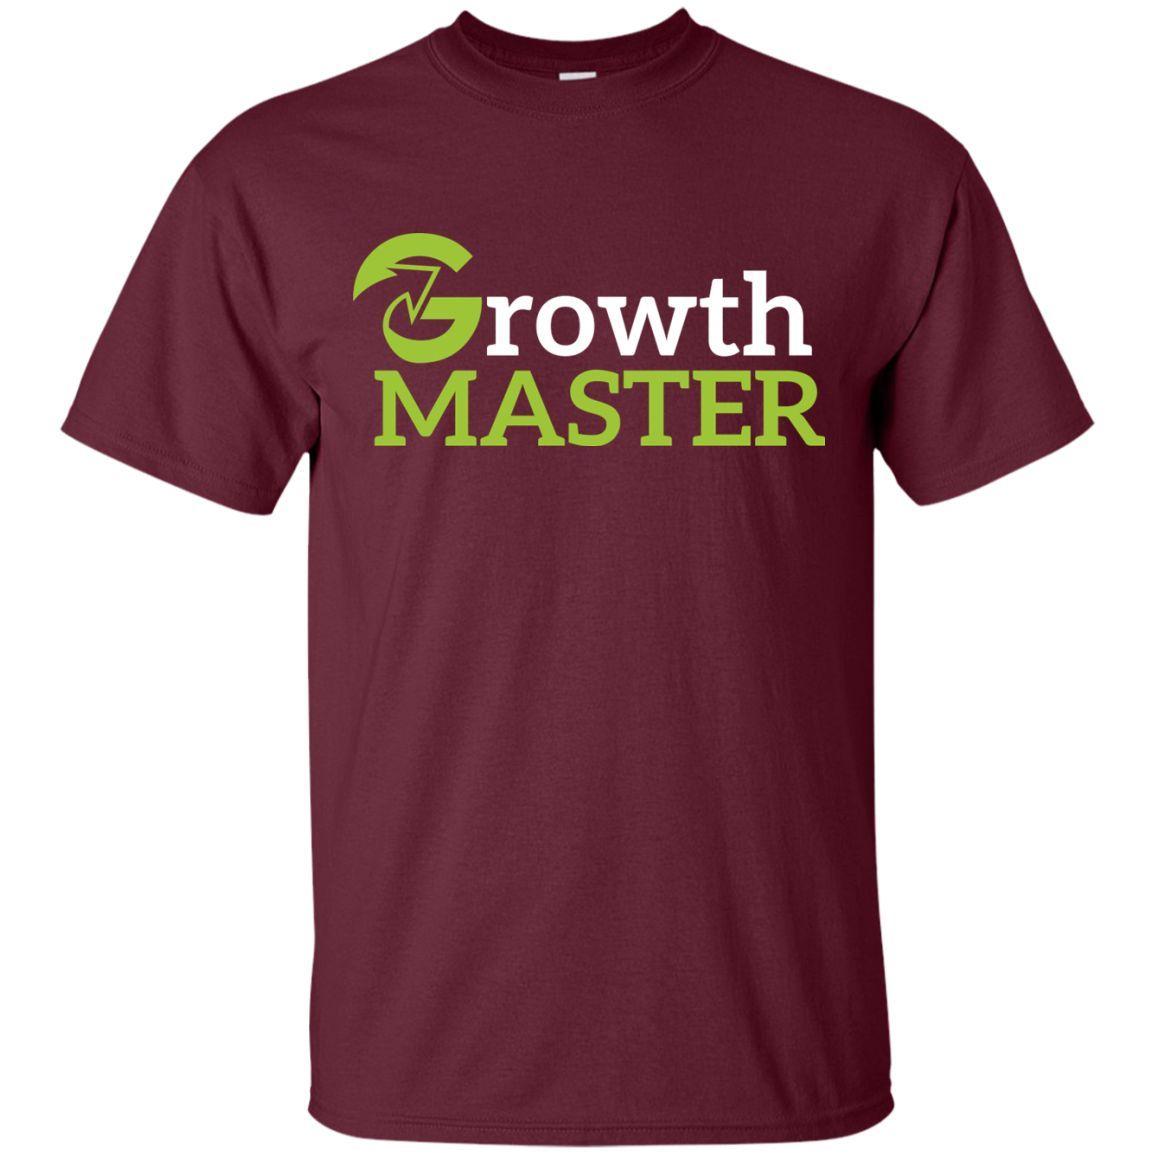 Growth Master T-Shirt